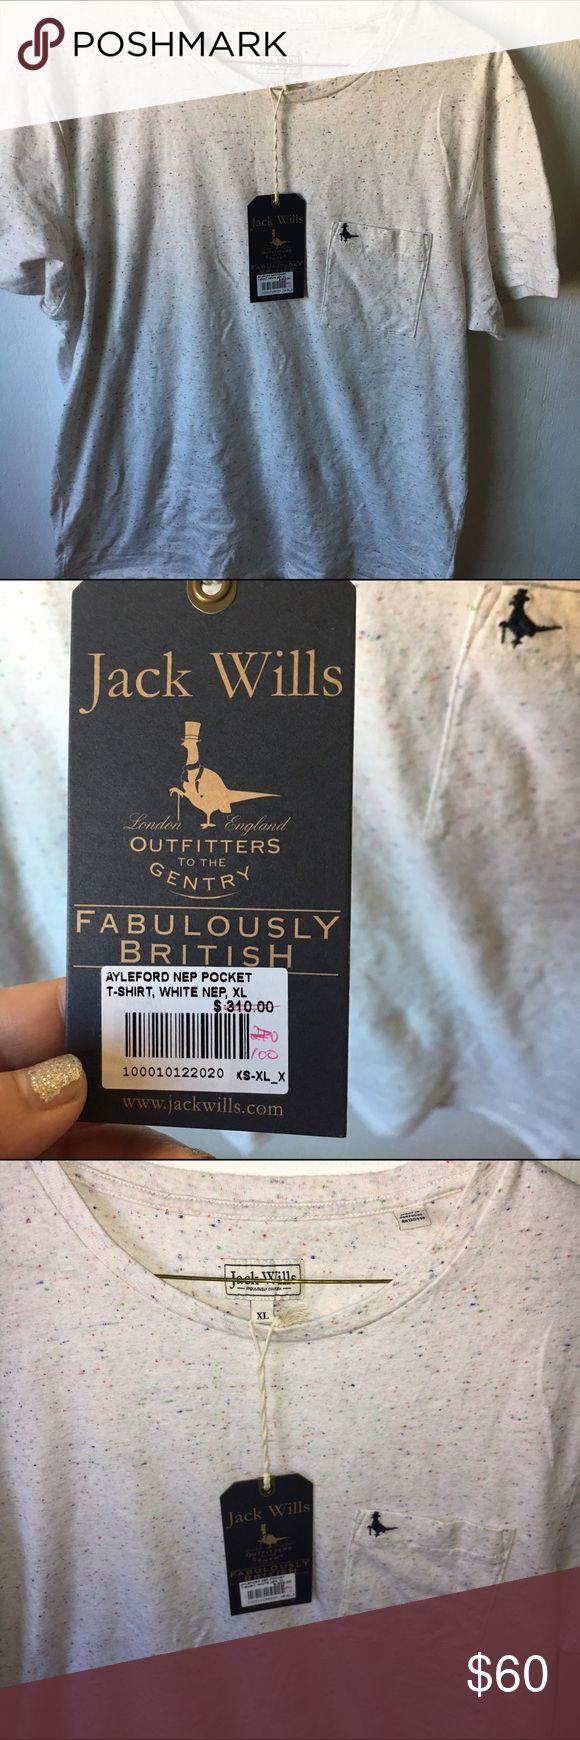 Jack Wills Top Shirt Tee Speckled Size XL Jack Wills Top Shirt Tee Speckled Size XL, new with tags. Jack Wills Tops